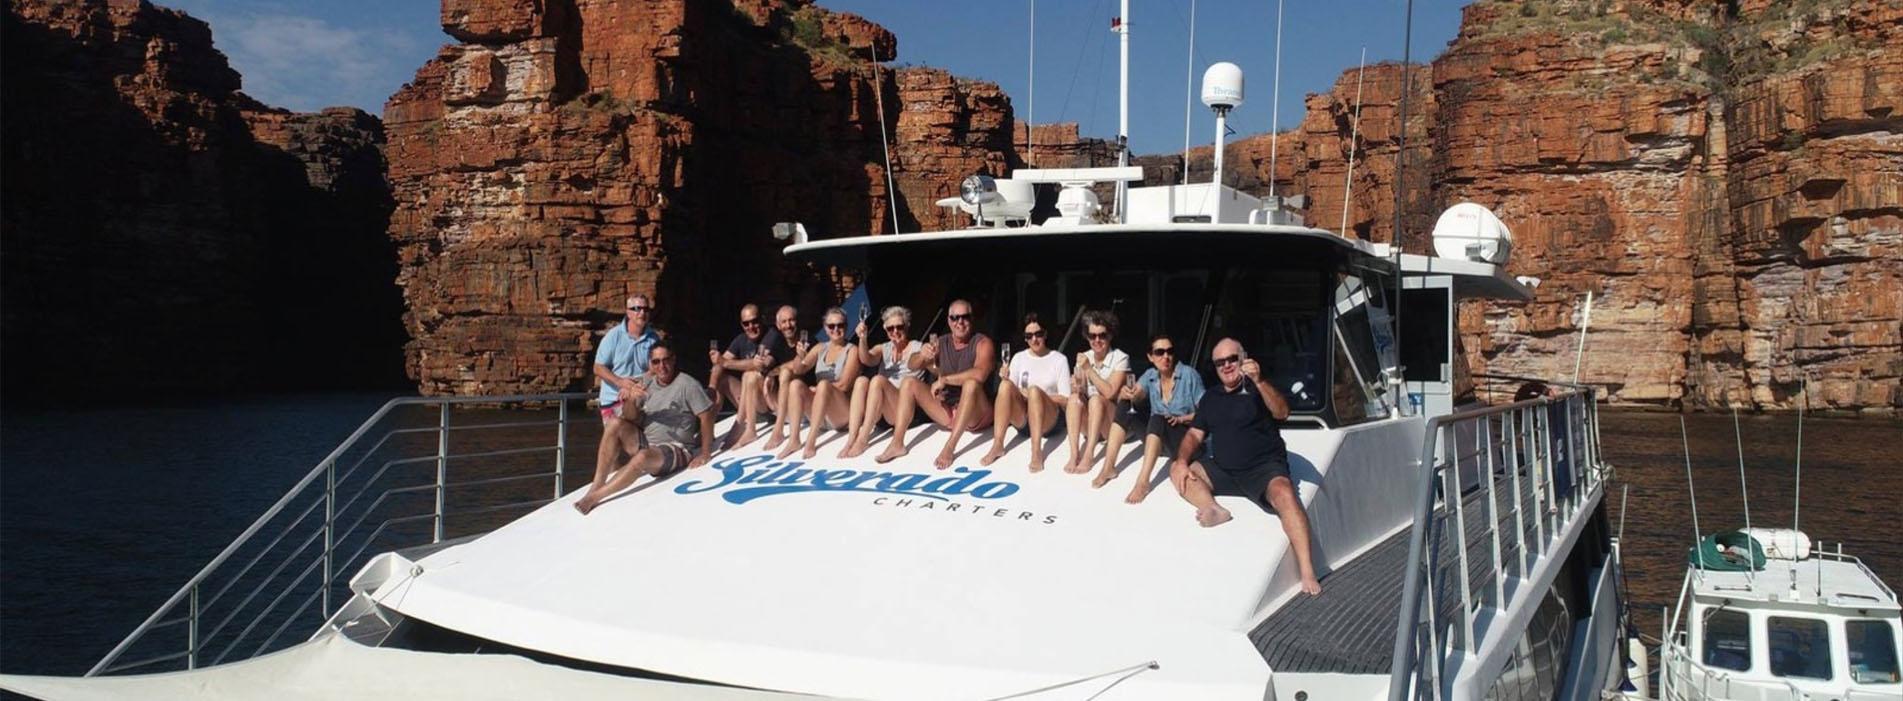 SILVERADO boat charters Perth WA Kimberley cruise people on bow